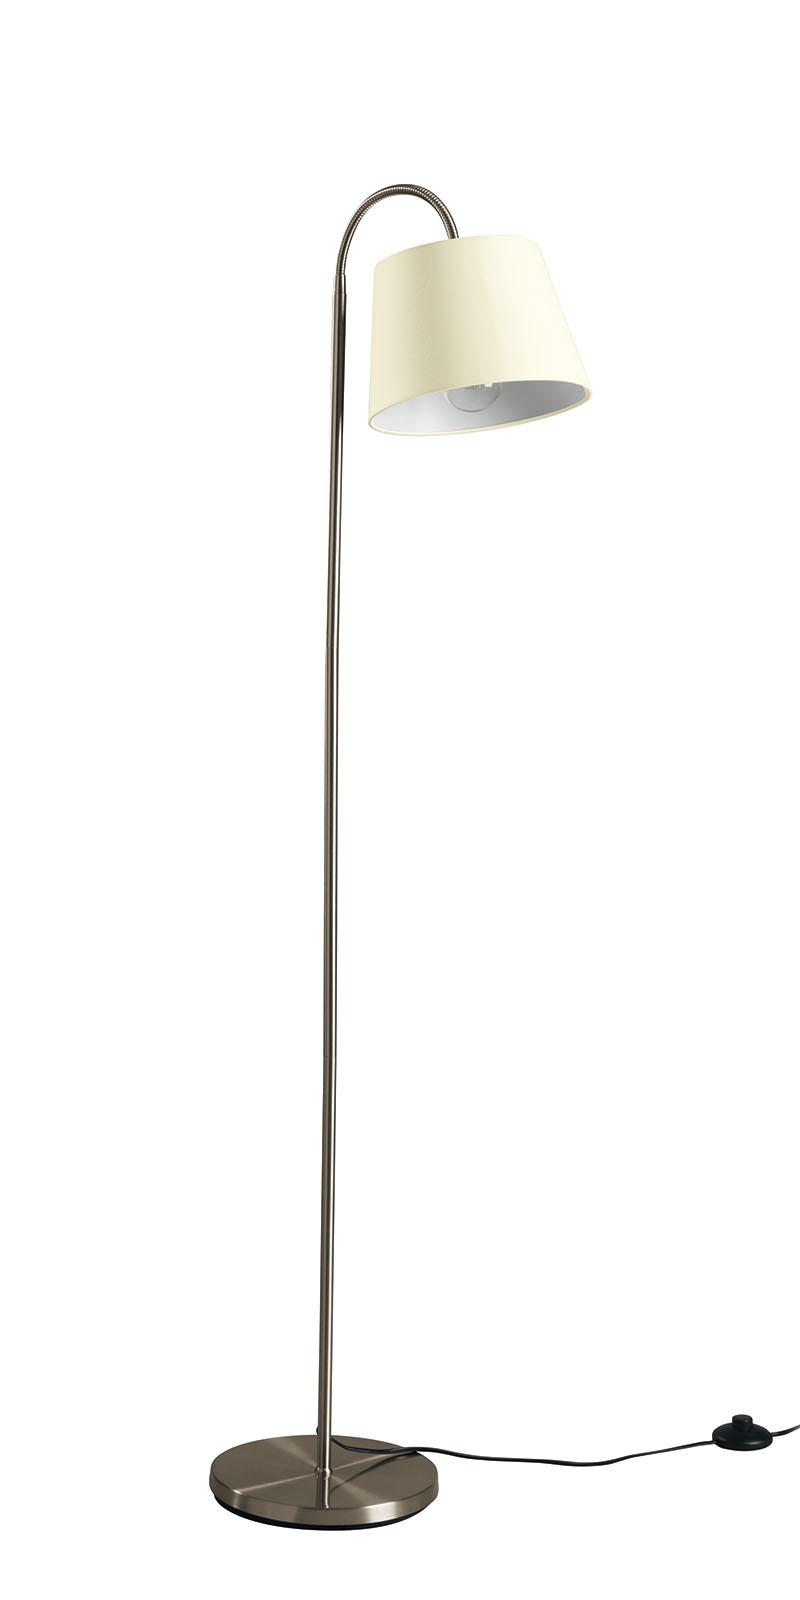 Beistellleuchte led textil creme stehlampe stehlampe for Stehlampe leselampe